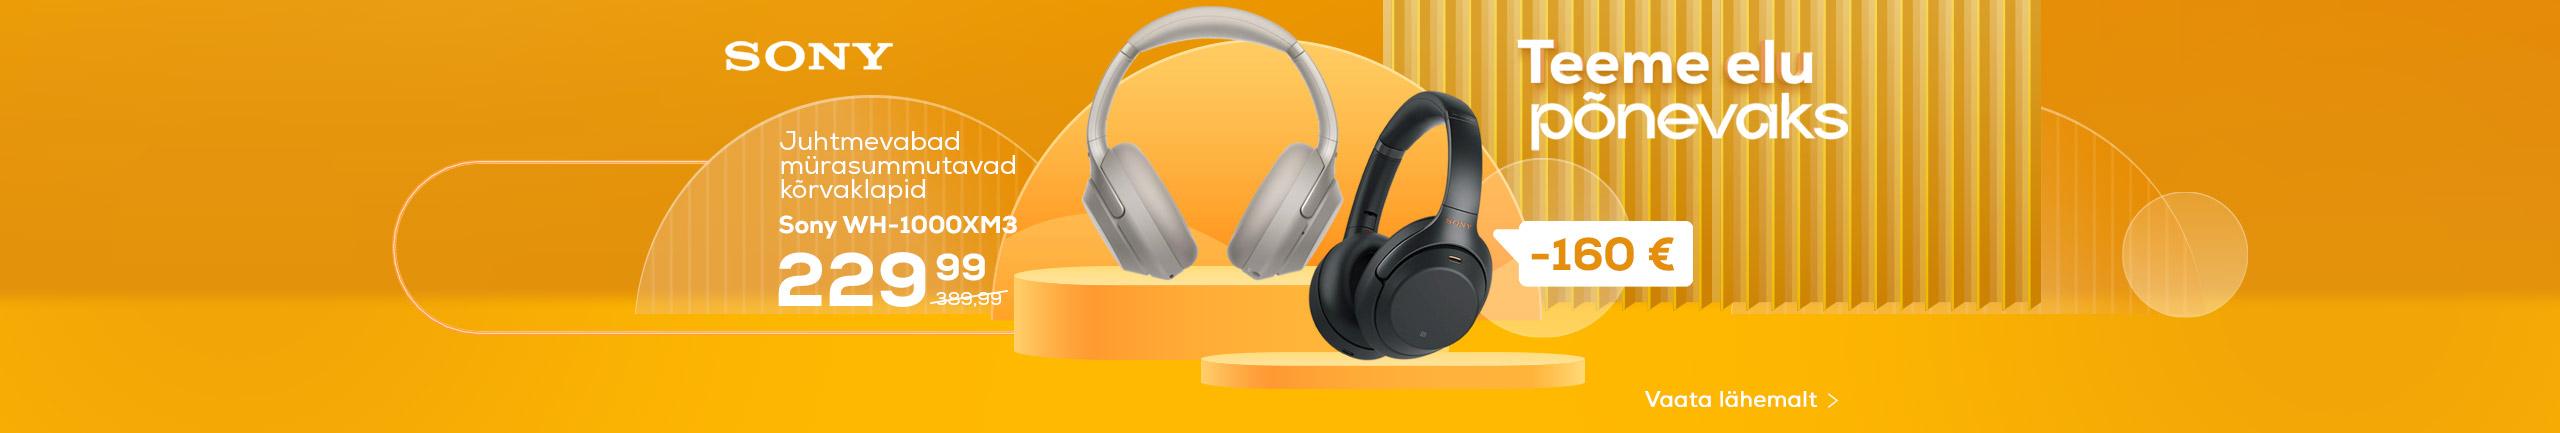 NPL We make life easy! Sony headphones WF1000